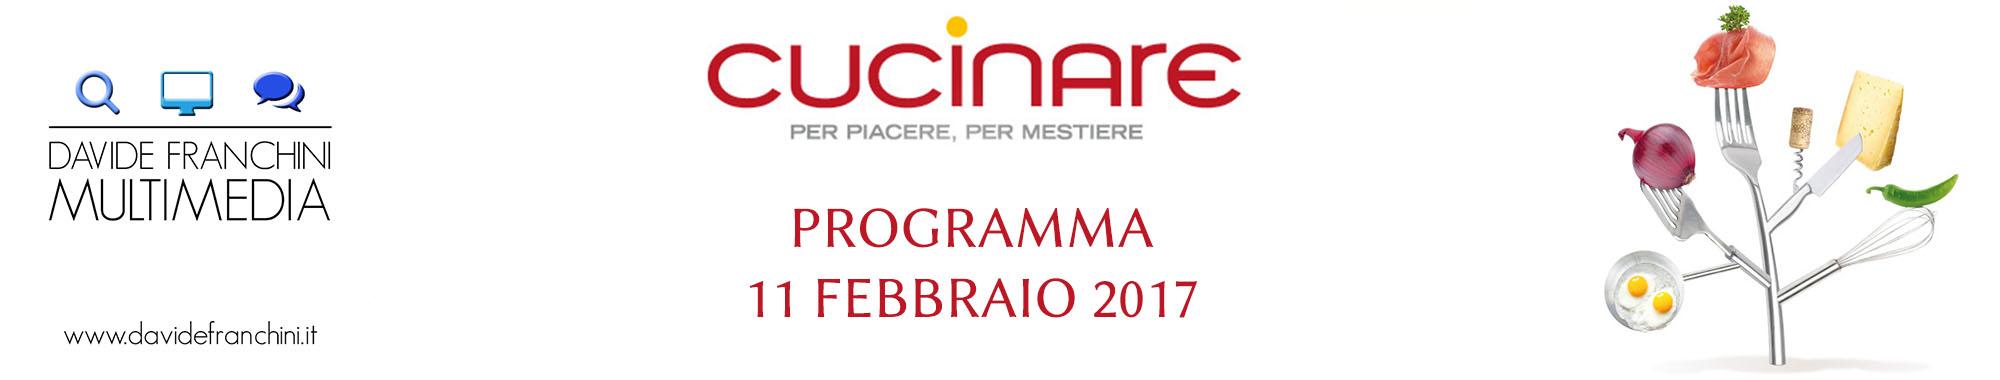 cucinare pordenone 2017 programma sabato 11 febbraio